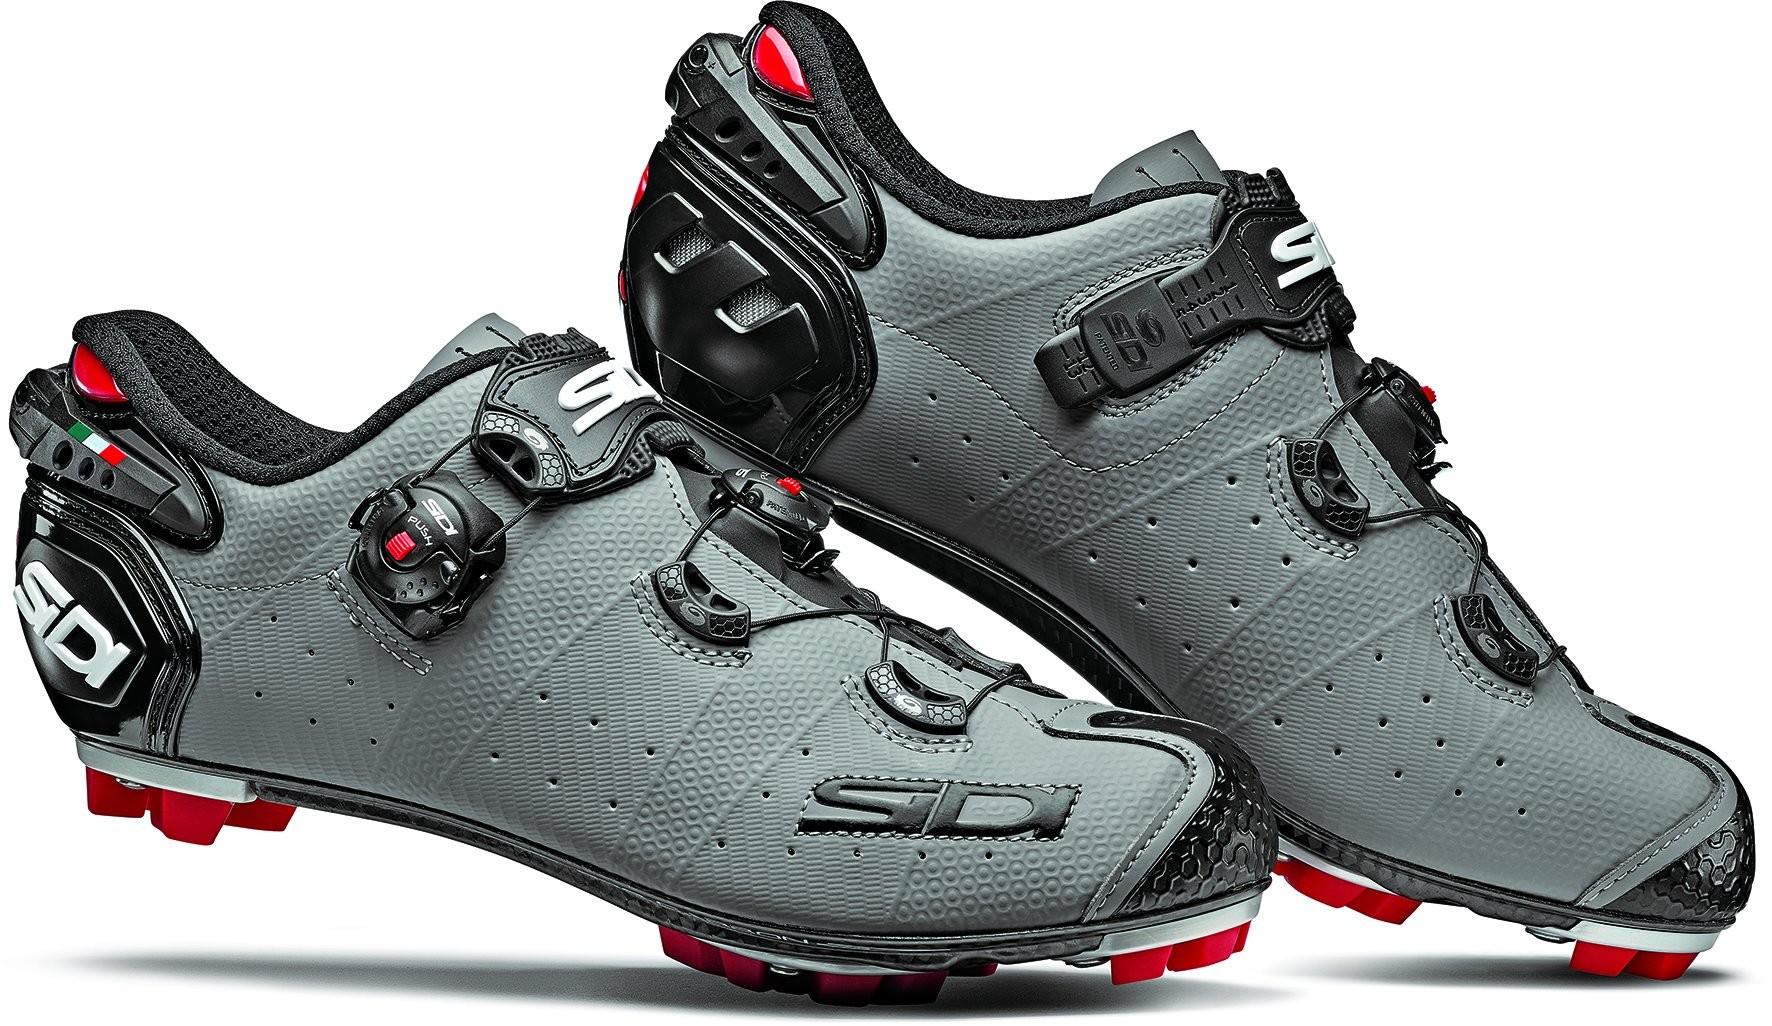 Zapatos de Bicicleta SIDI MTB Drako 2 Srs Talla 45 Negro Mate gris